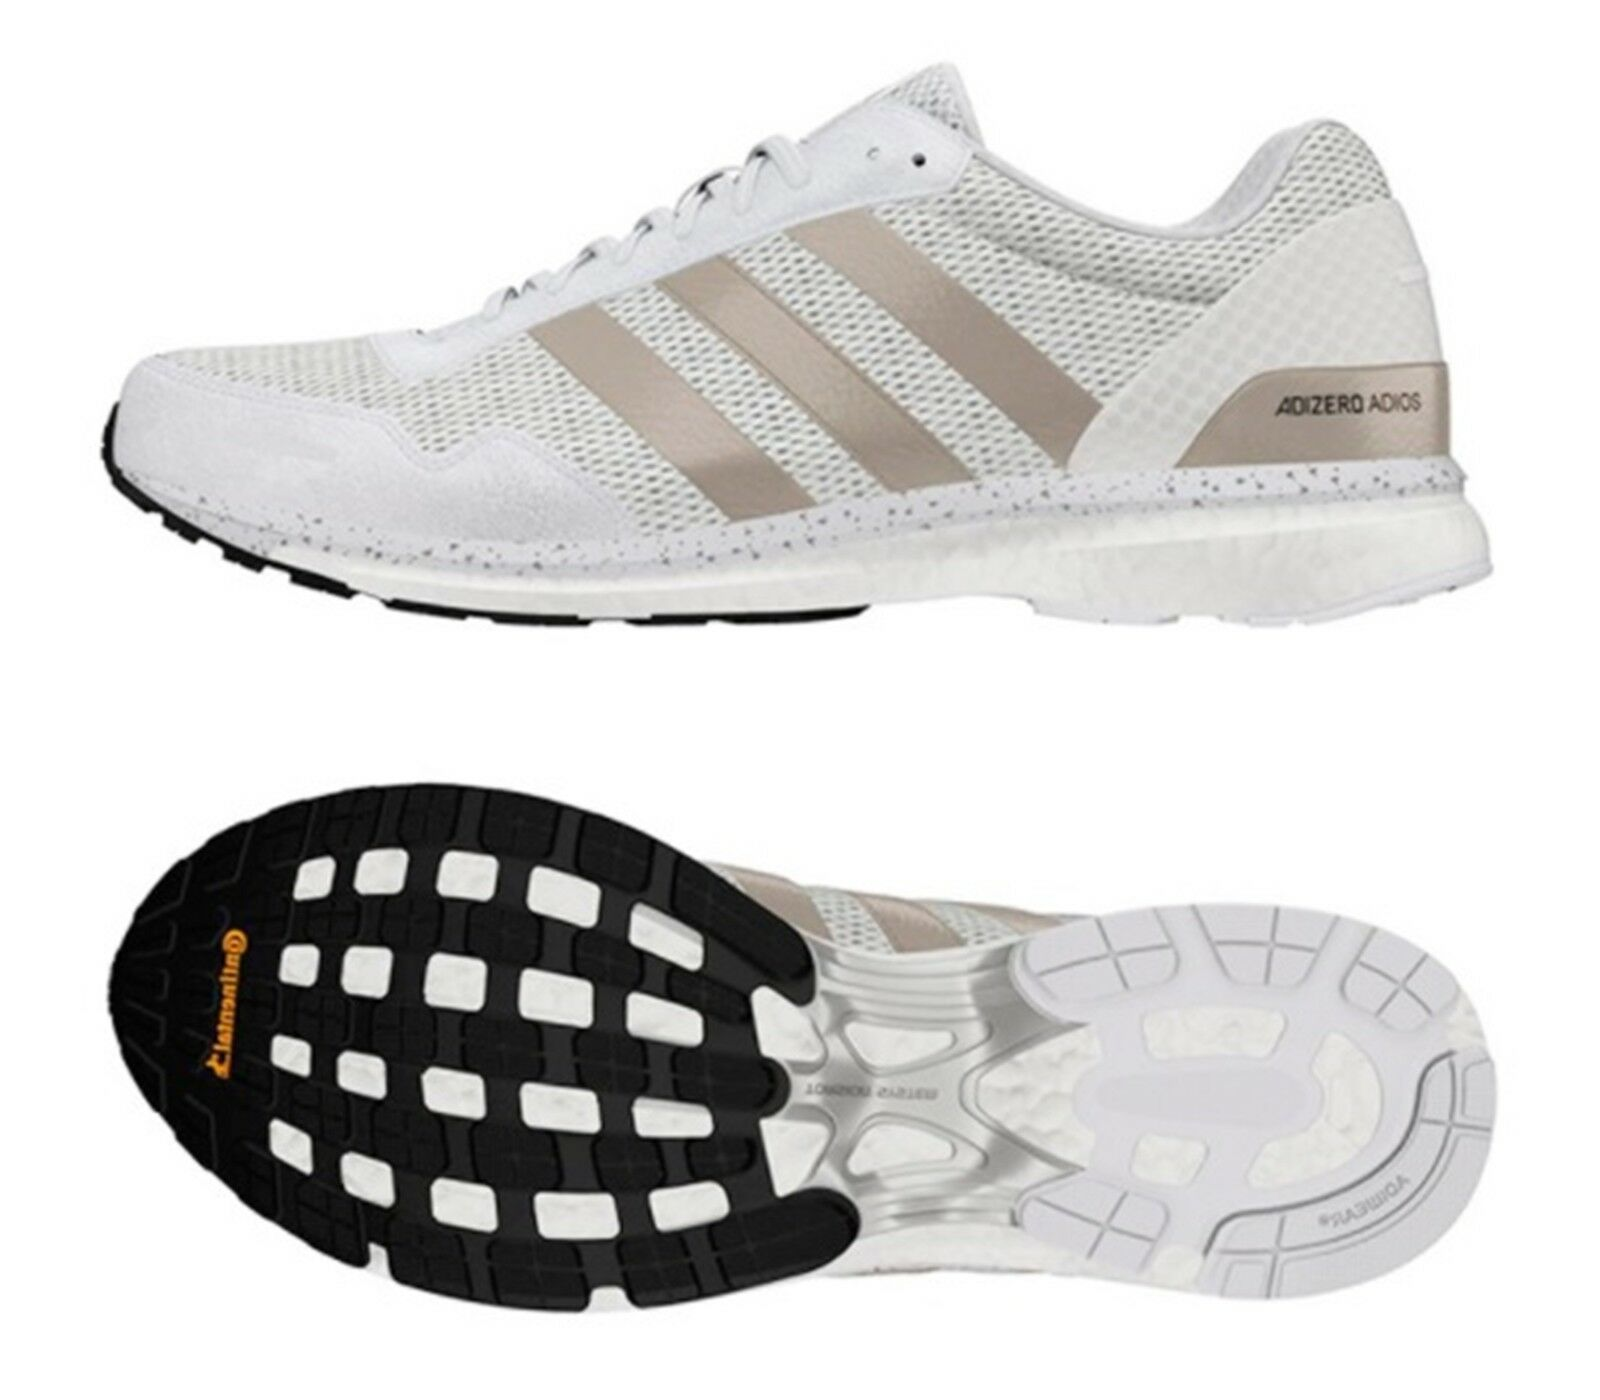 fbf2e97ecd4f6 Adidas Men Adios Training shoes Running White Sneakers GYM shoes BB6439  Adizero njubwp8858-Men